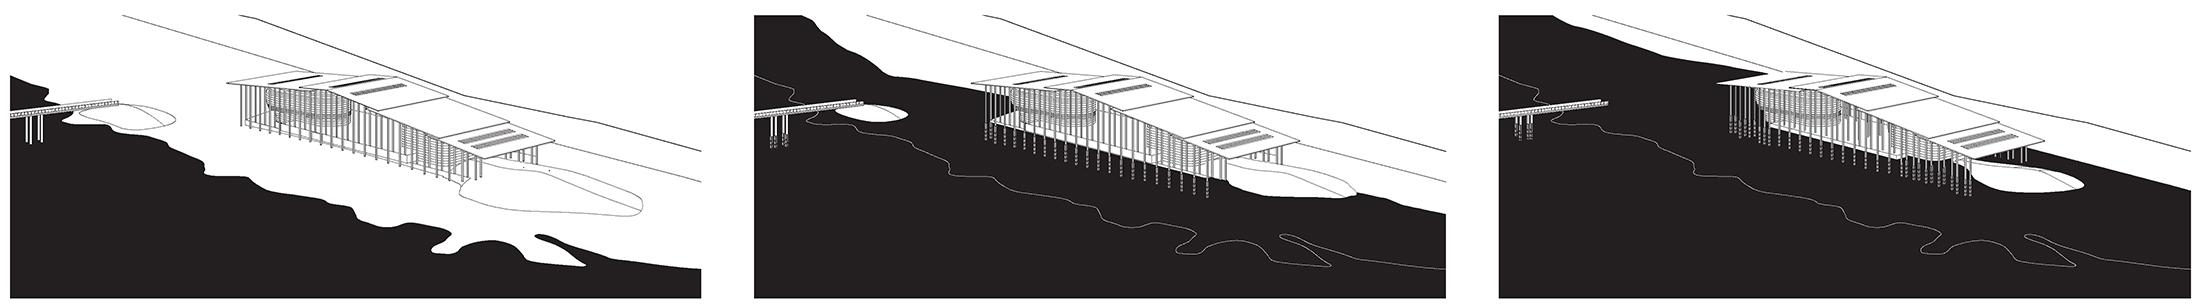 Flood Responsiveness Diagrams.